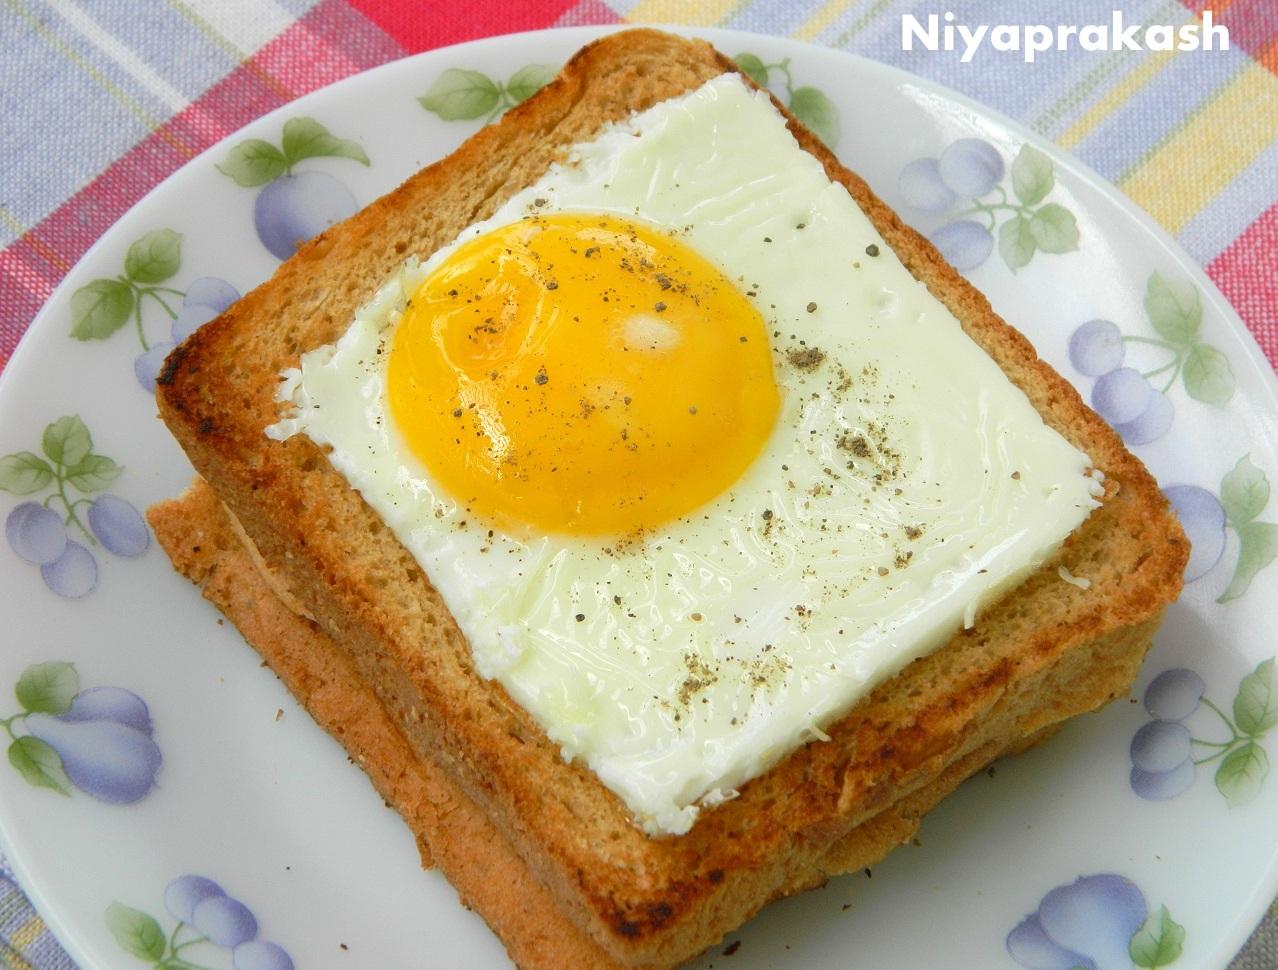 Niya S World Photos Of Homemade Dishes Egg Ring Fried Watermelon Wallpaper Rainbow Find Free HD for Desktop [freshlhys.tk]